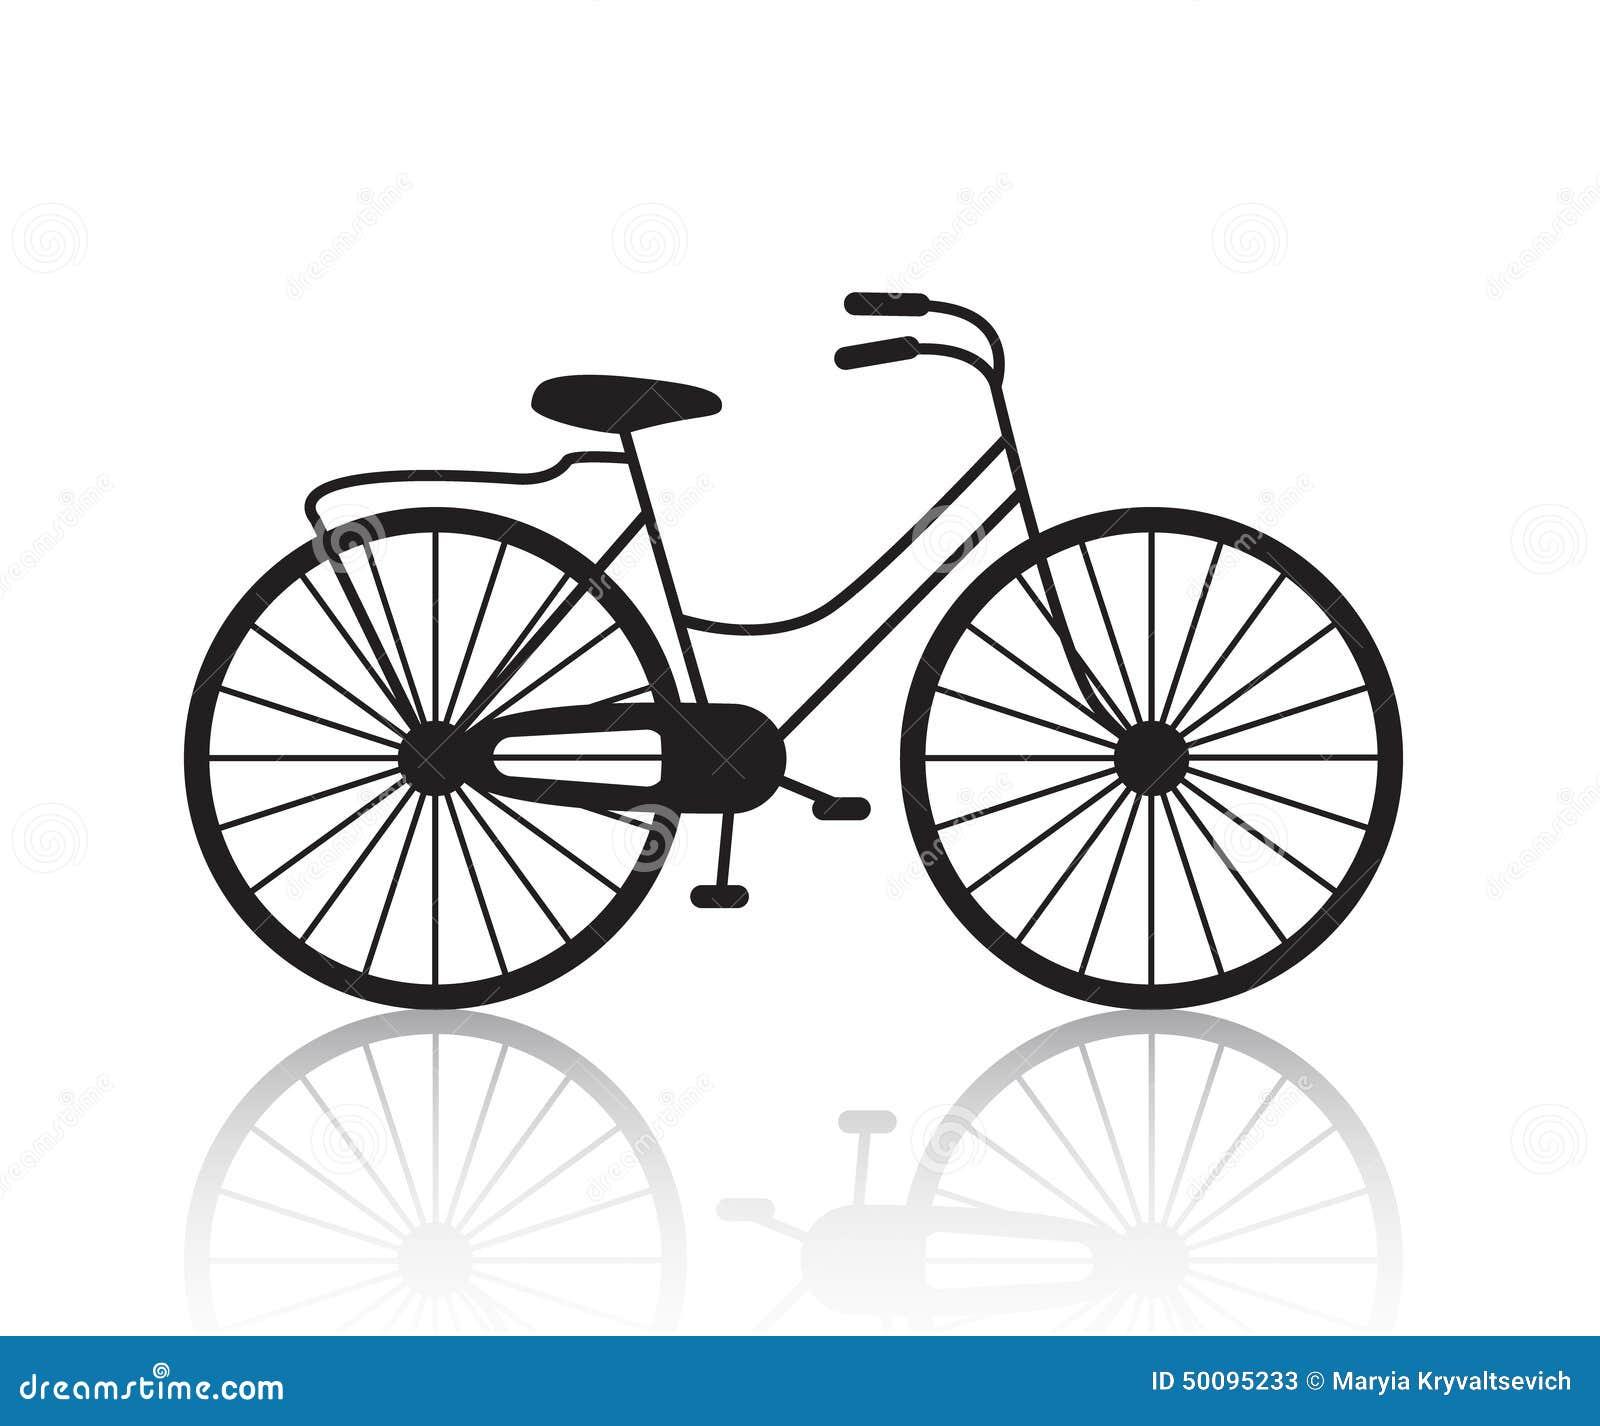 Vector Vintage Retro Bicycle Silhouette, Icon Stock Vector